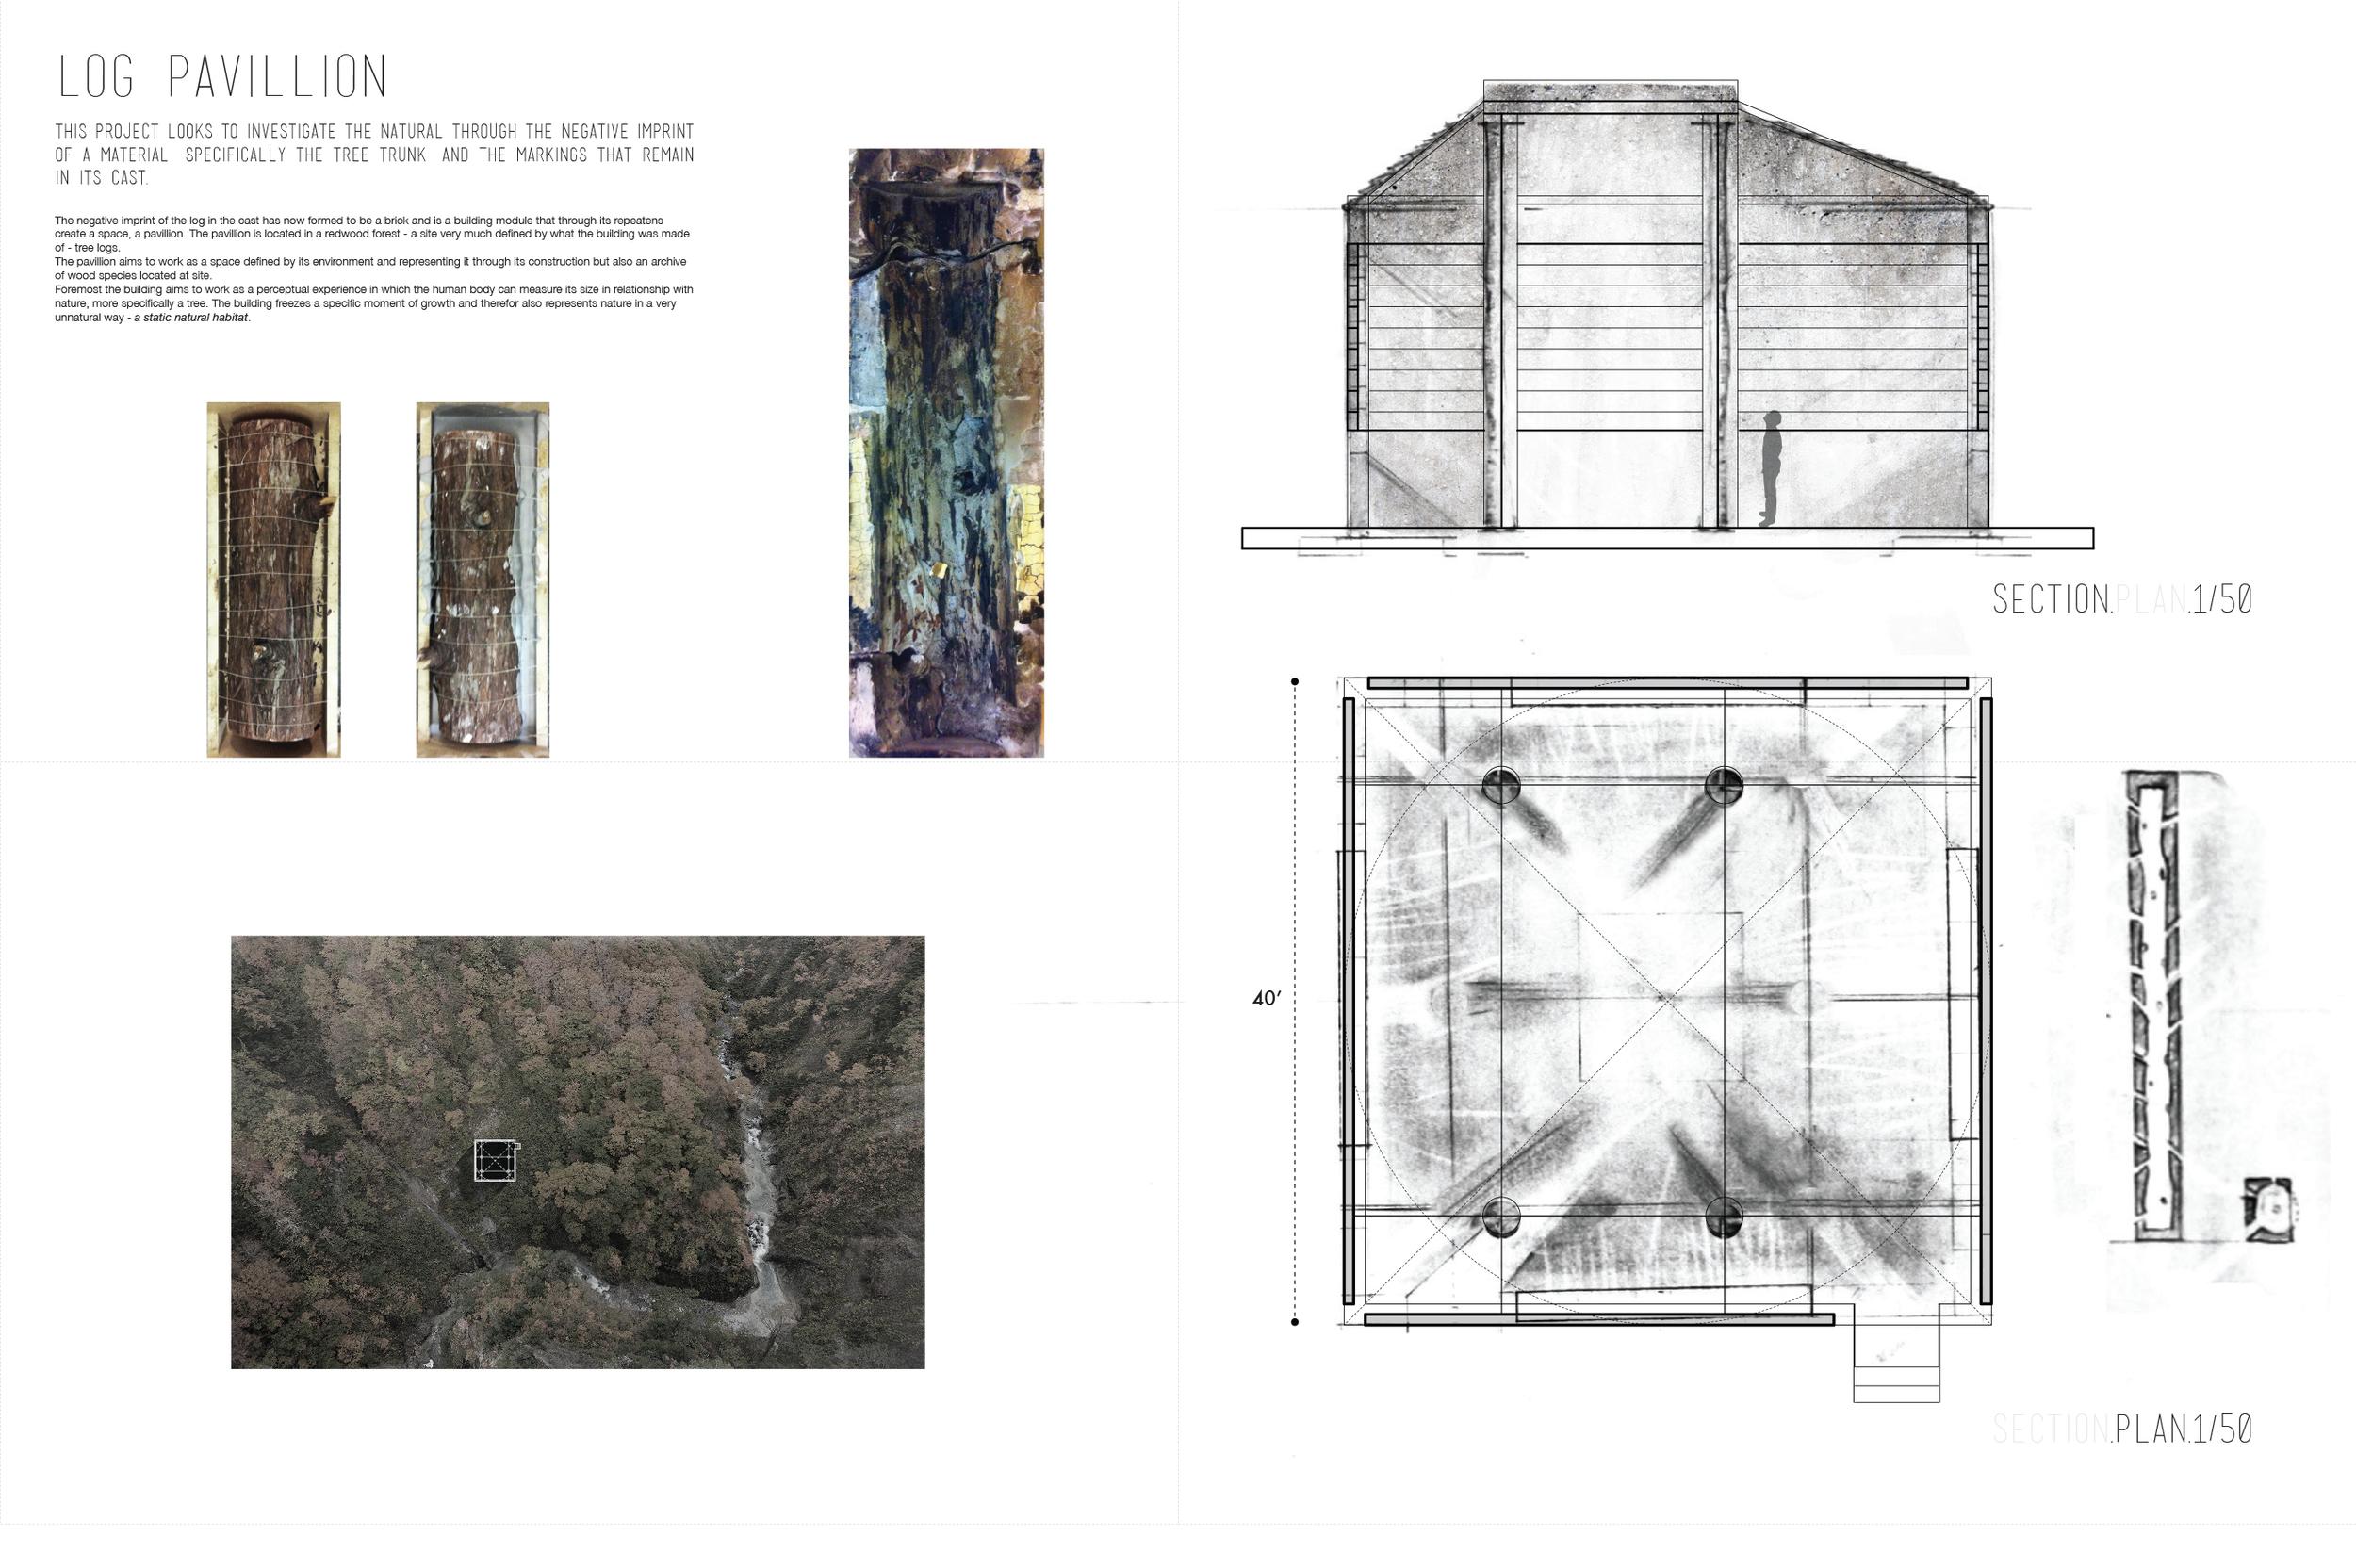 Fruergaard-Victor_2014-Fall-CCA-Perceptual-Shifts_Pavillion-Drawing.jpg